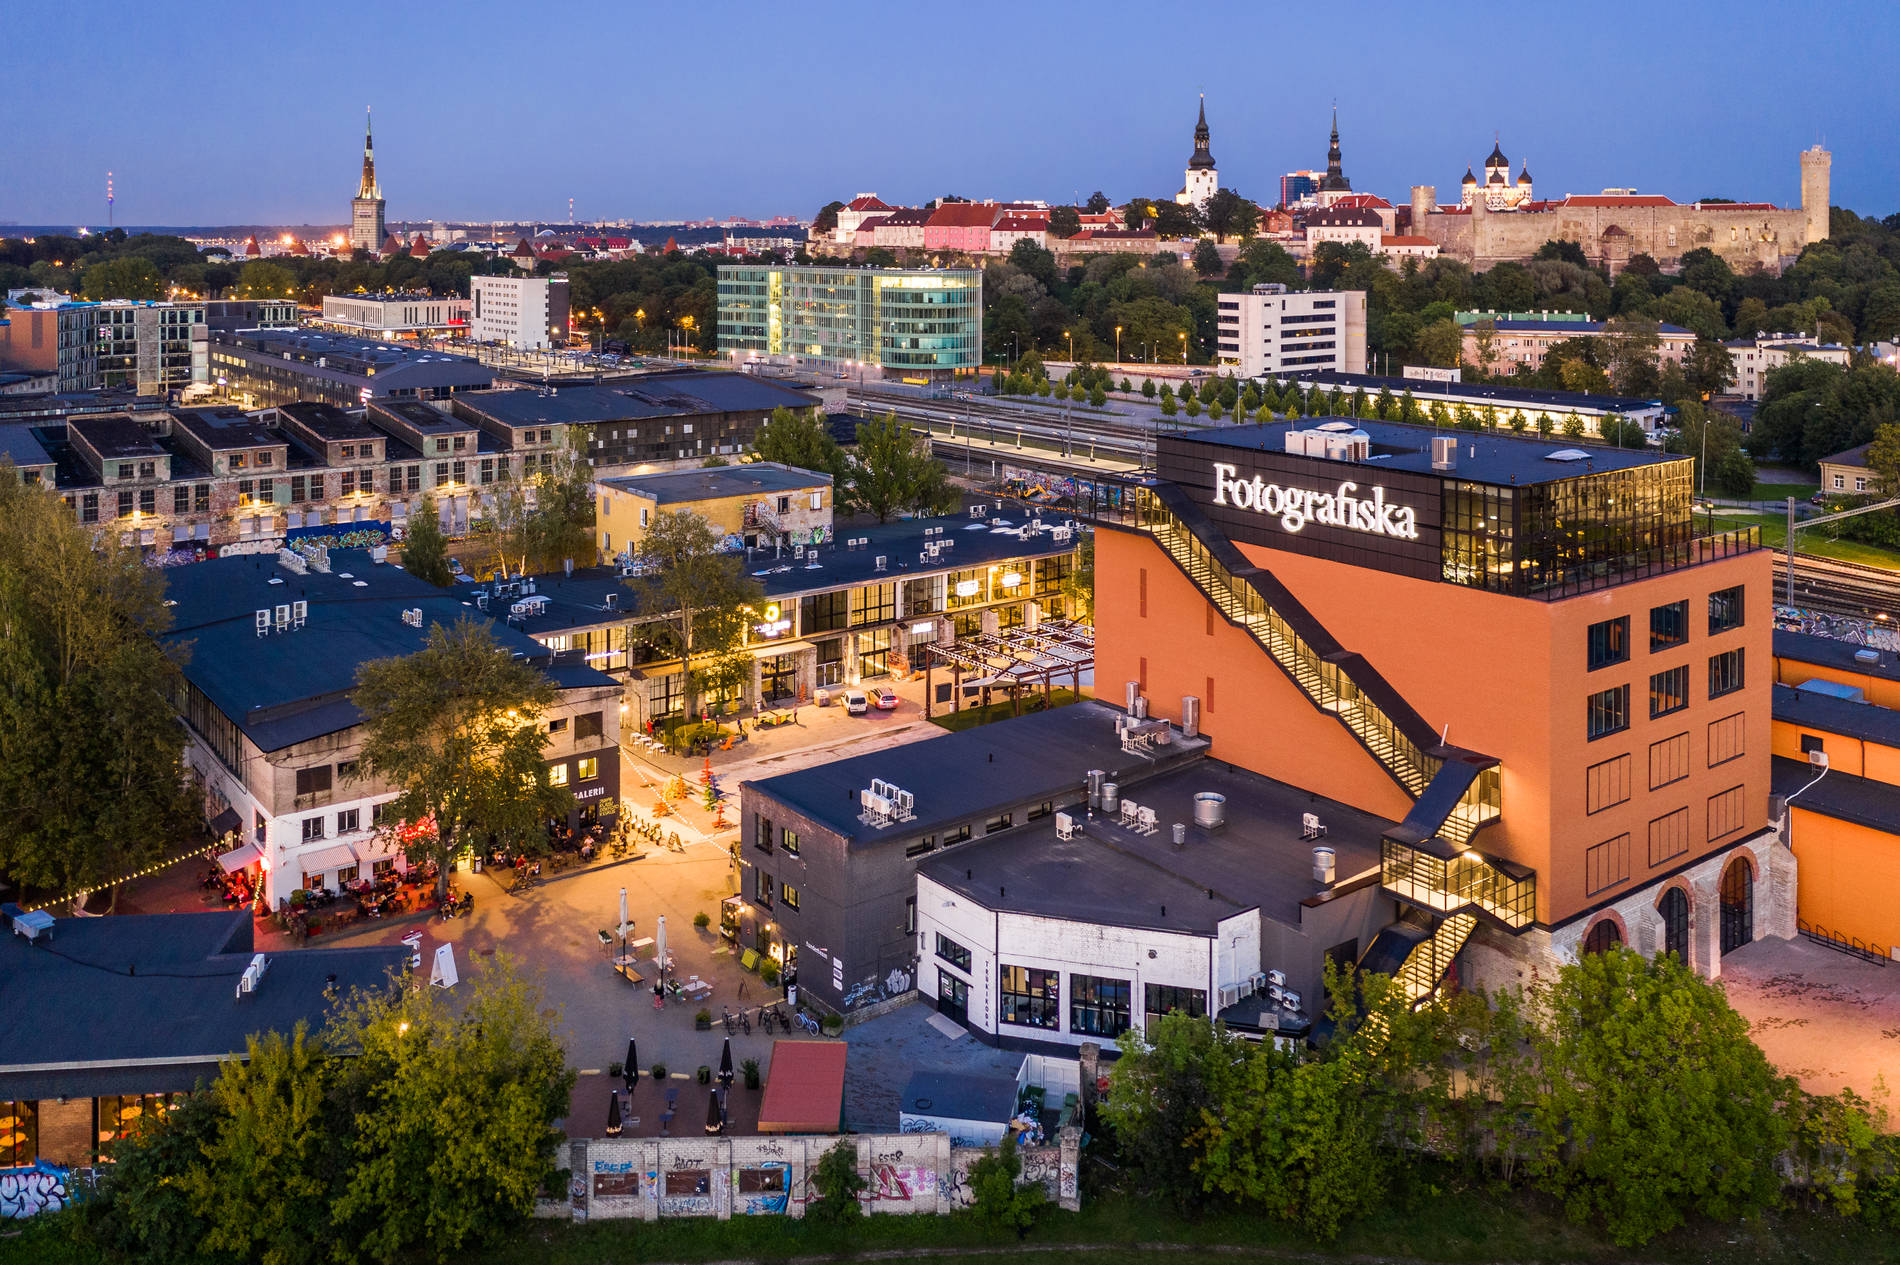 Fotografiska in Telliskivi Creative City, Tallinn